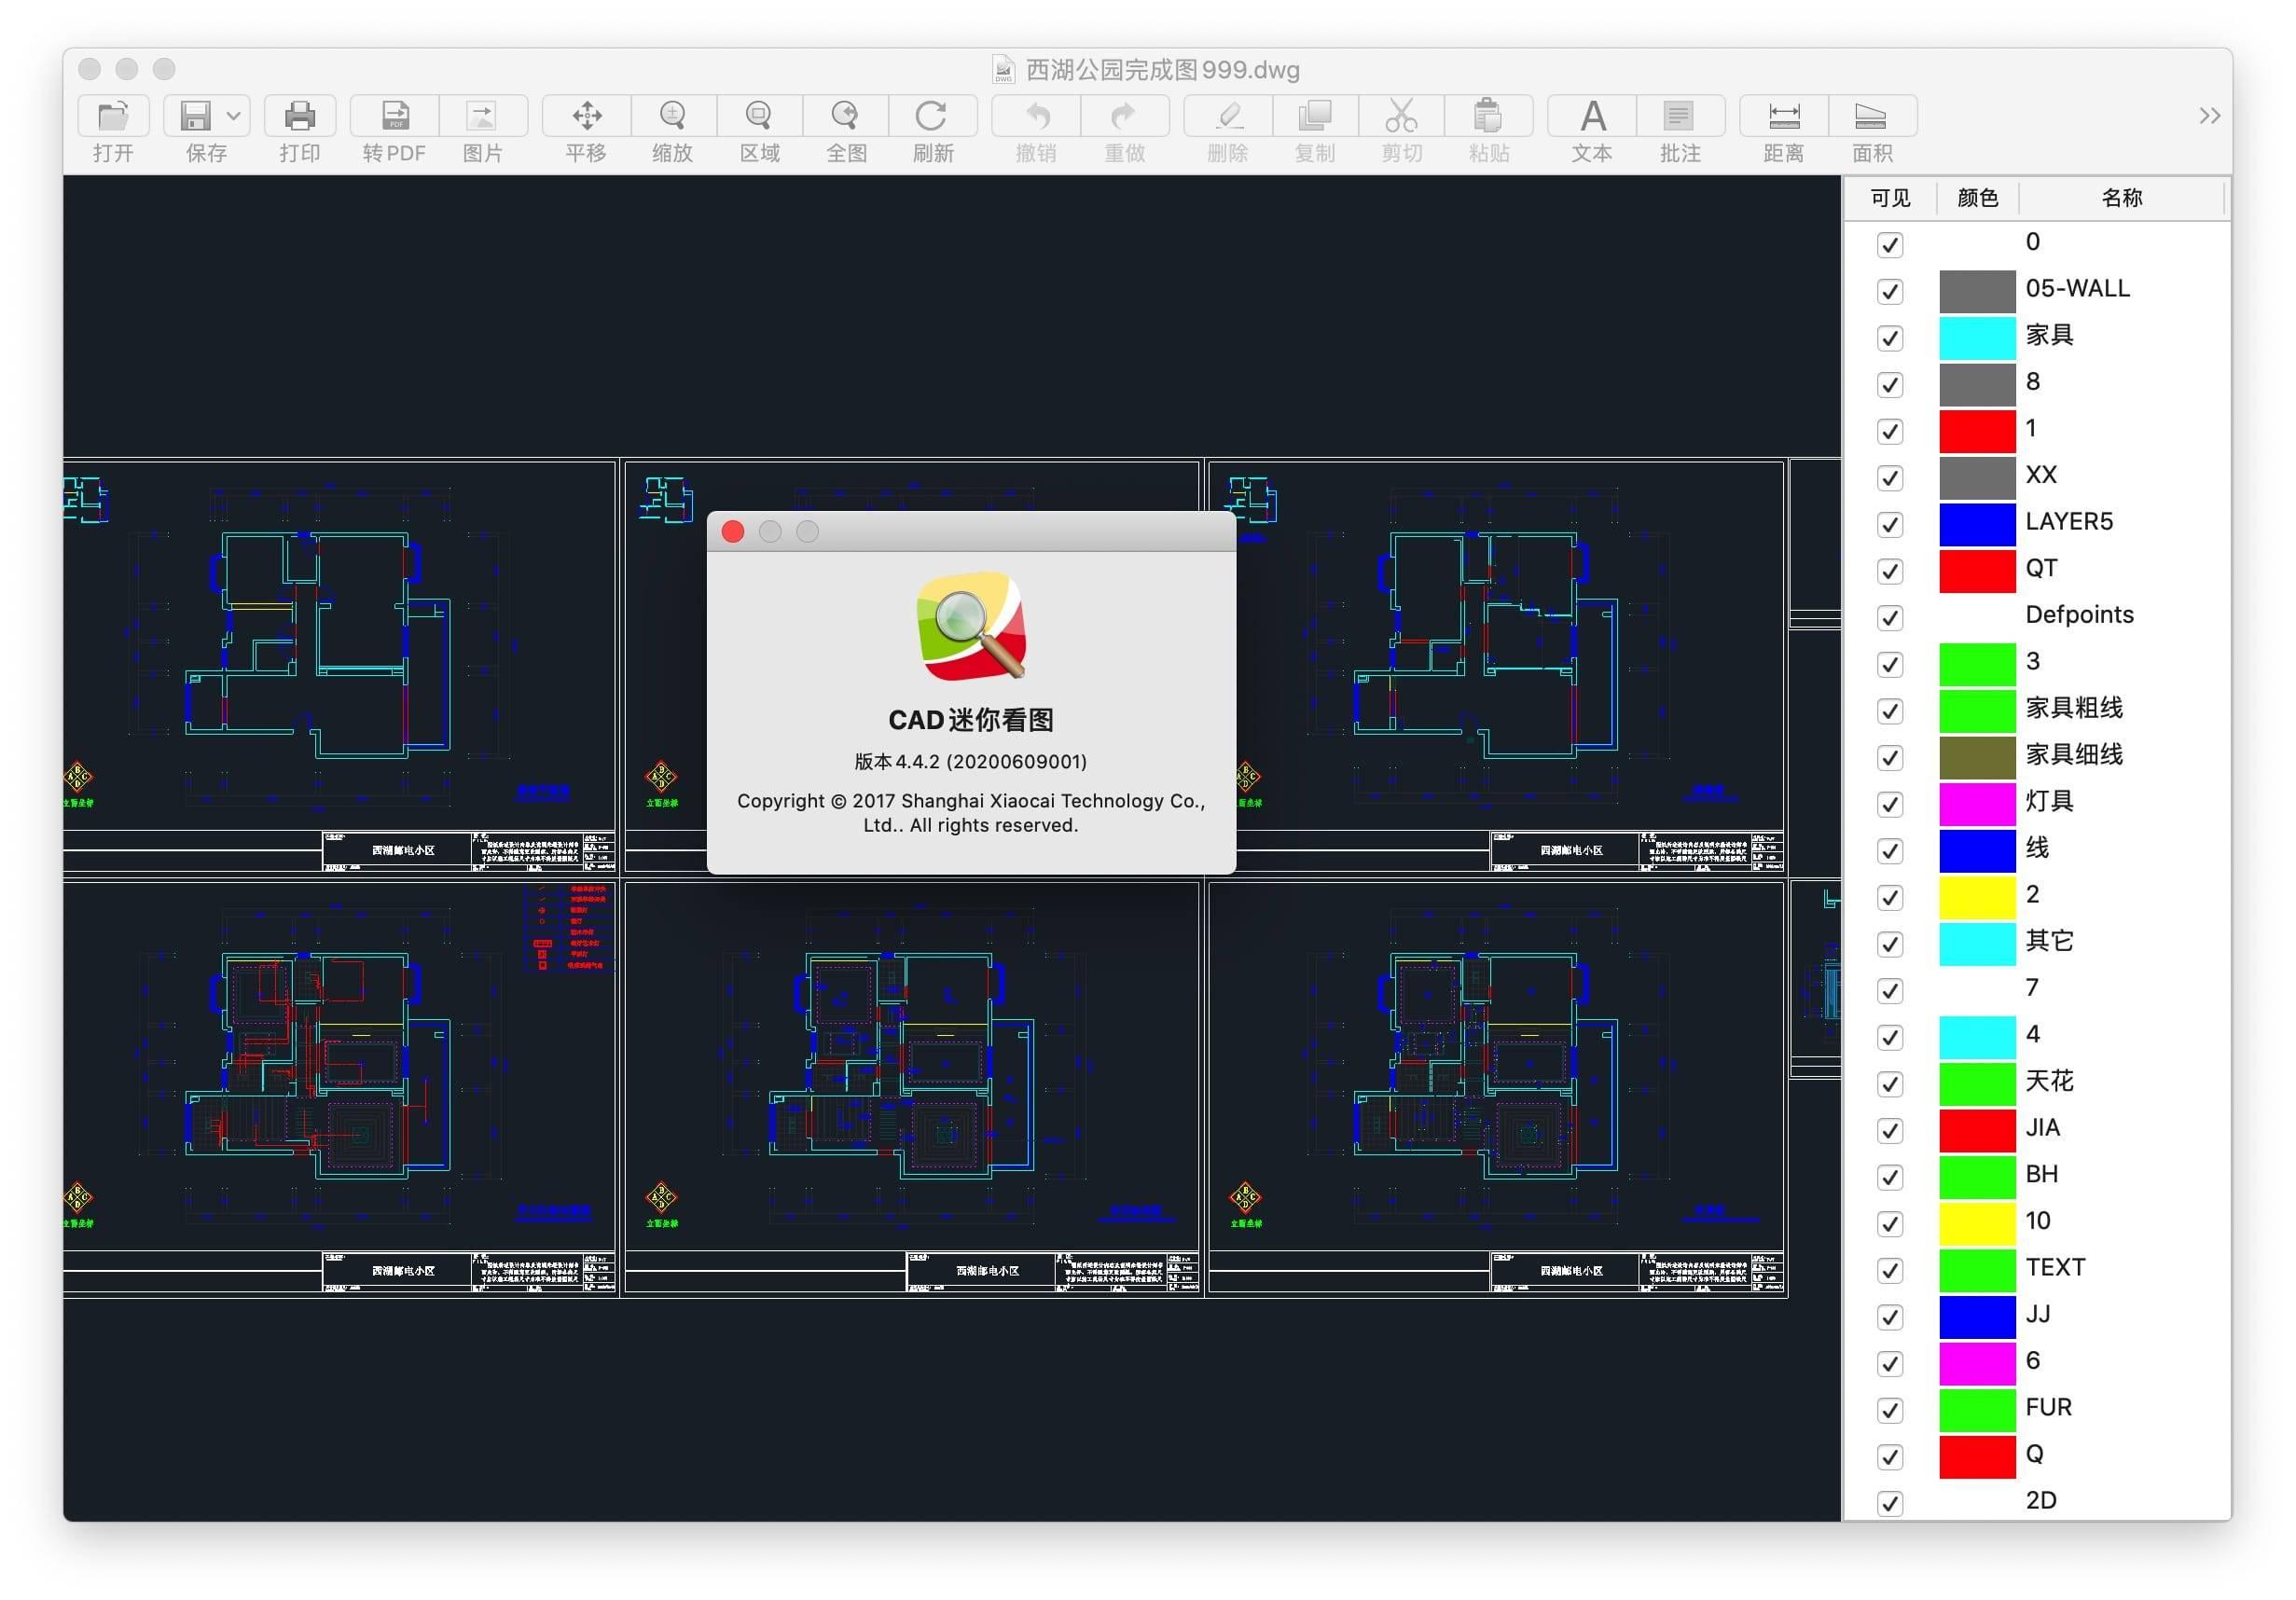 CAD迷你看图 for Mac 4.4.2 中文破解版 dwg文件快速查看 图片浏览 第2张